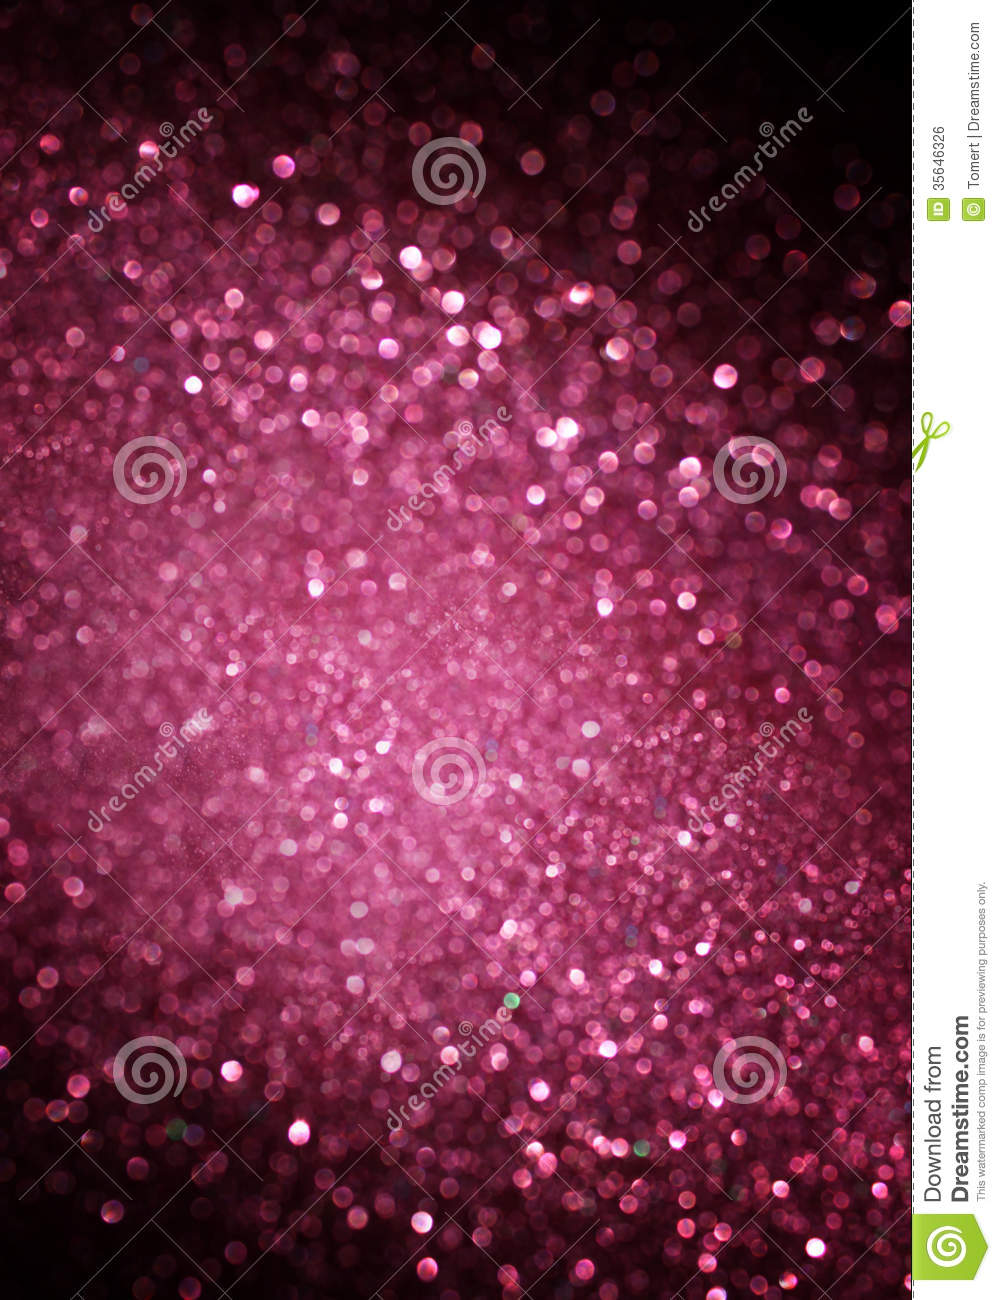 Light Pink Glitter Background Pink abstract glitter bokeh 1001x1300